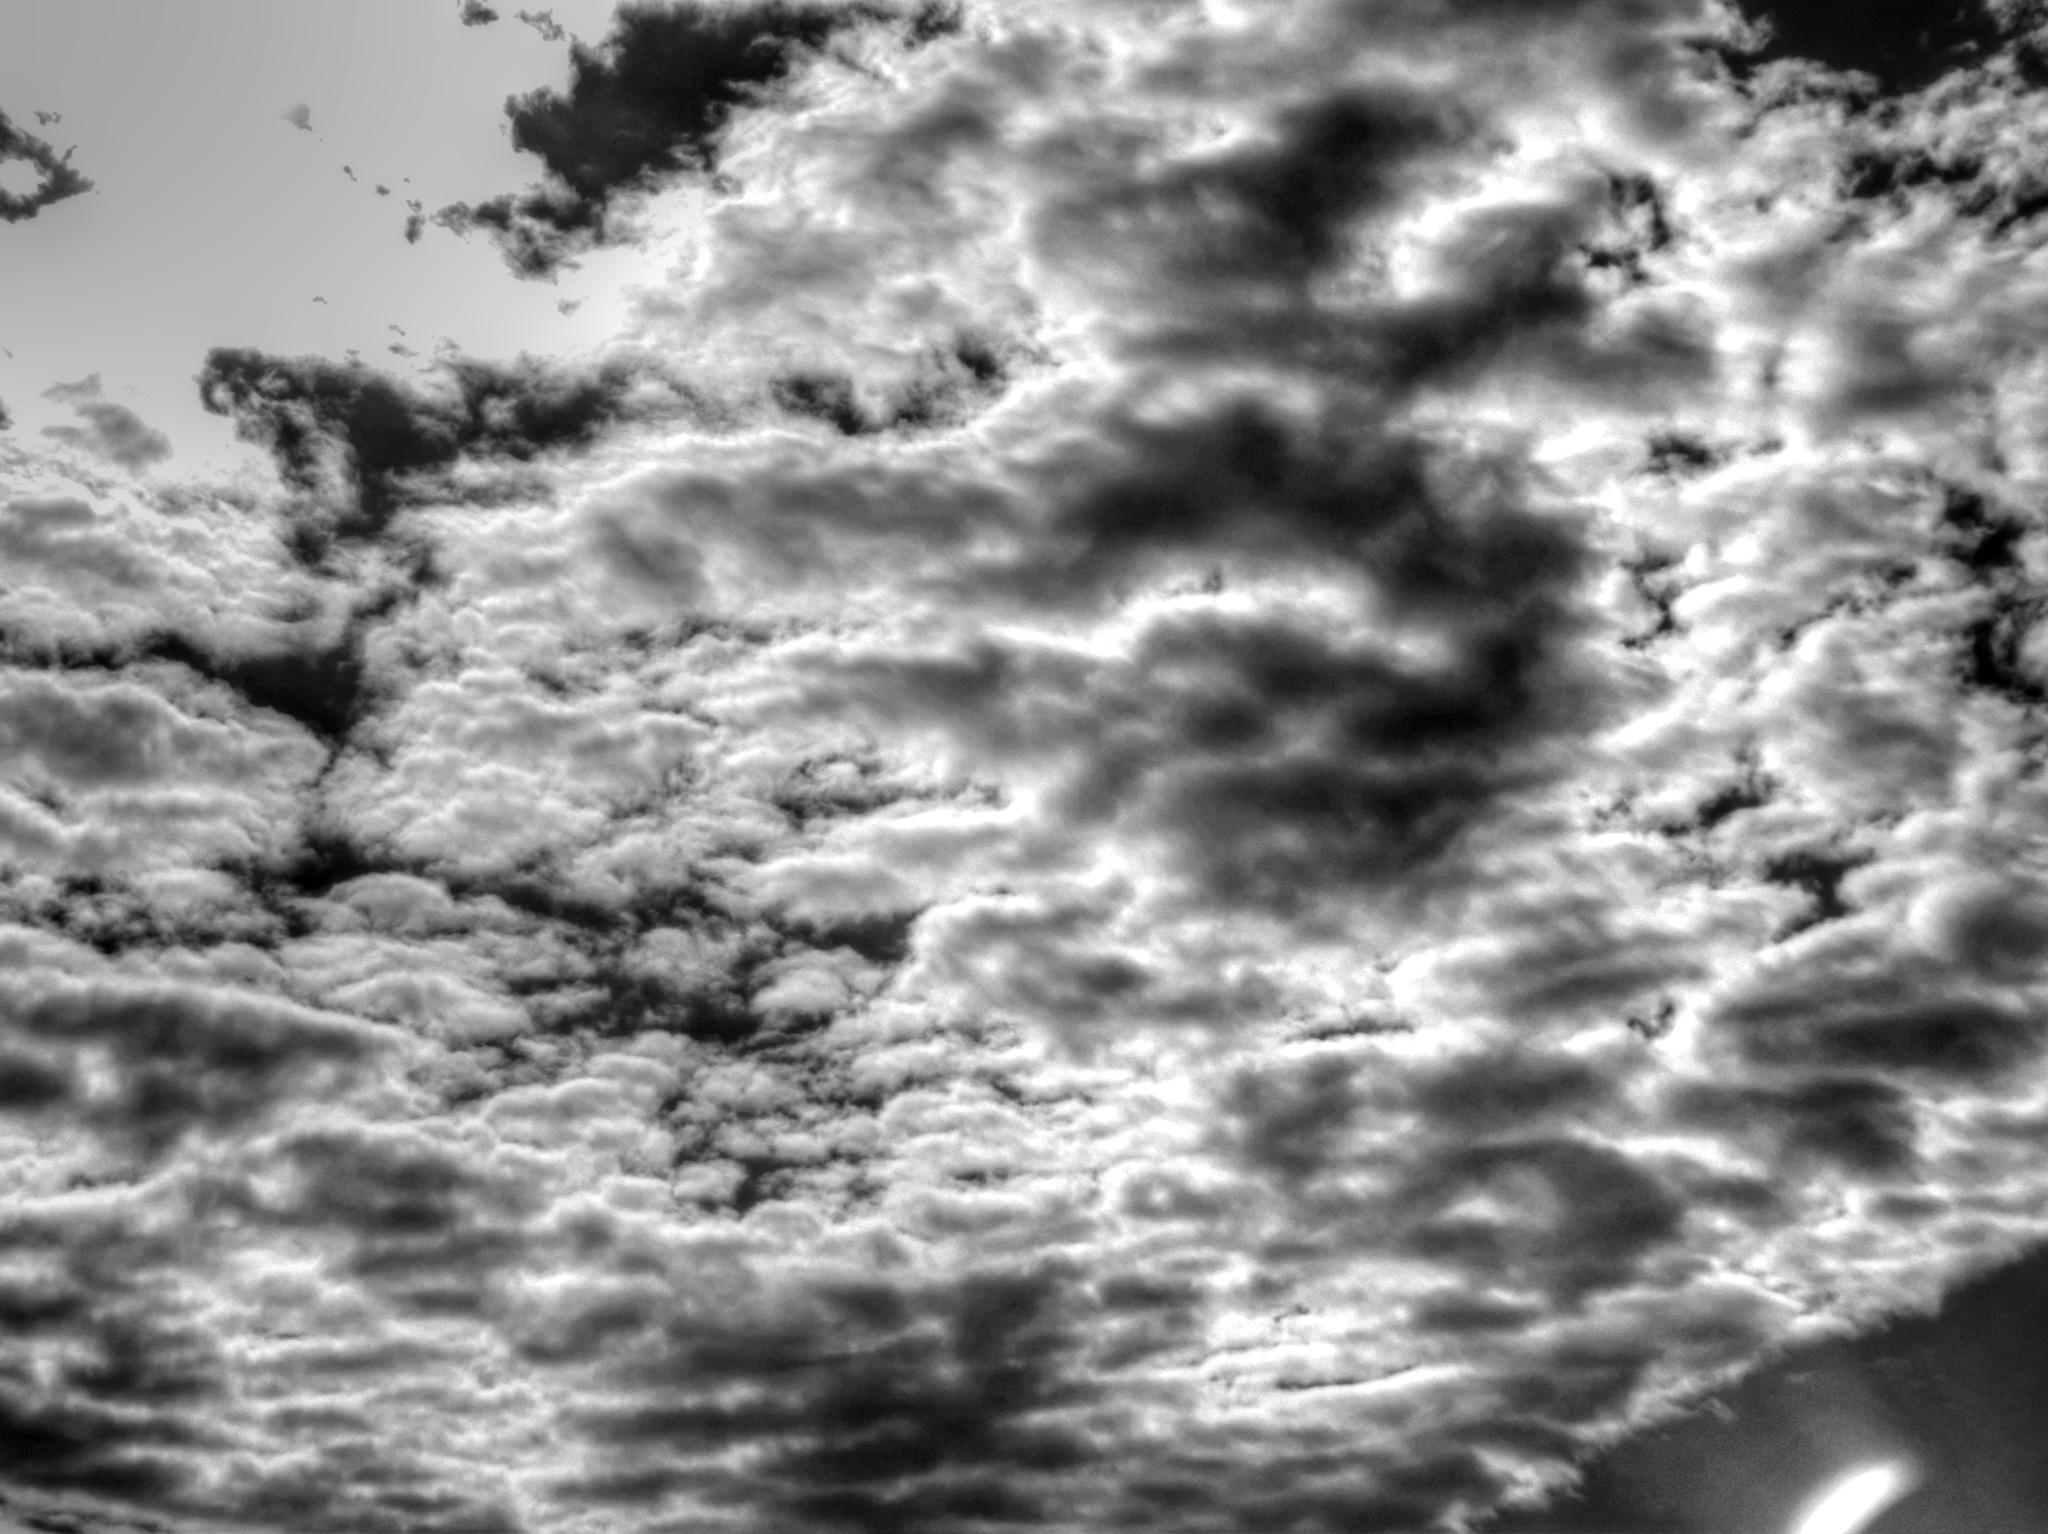 clouds by zvnktomasevic